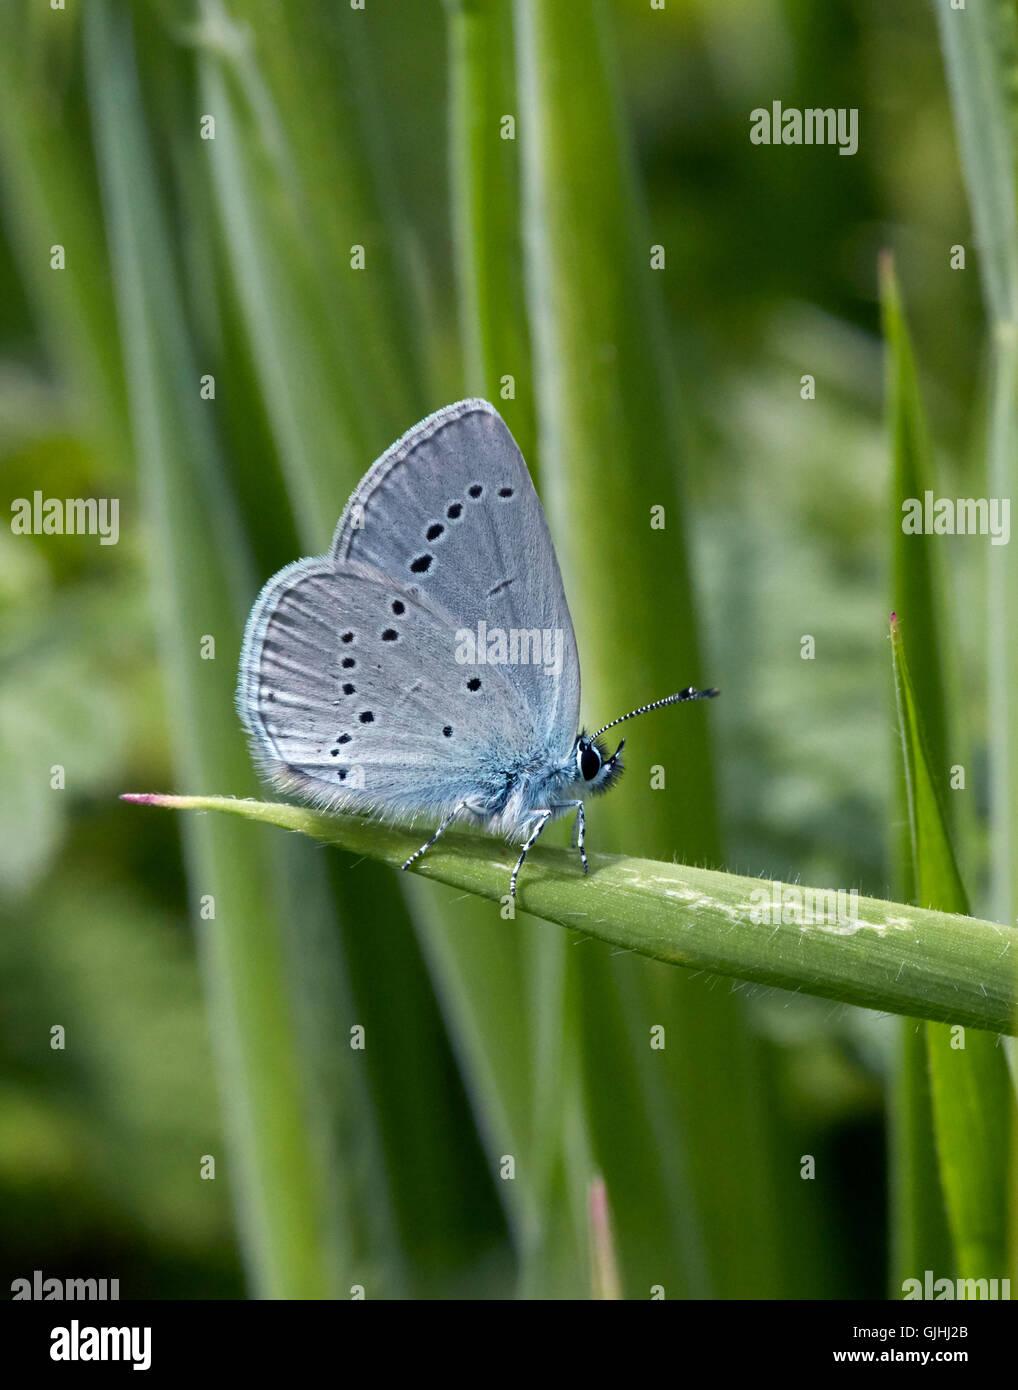 Pequeña mariposa azul posado sobre hierba. howell hill nature reserve, Ewell, Surrey, Inglaterra. Imagen De Stock